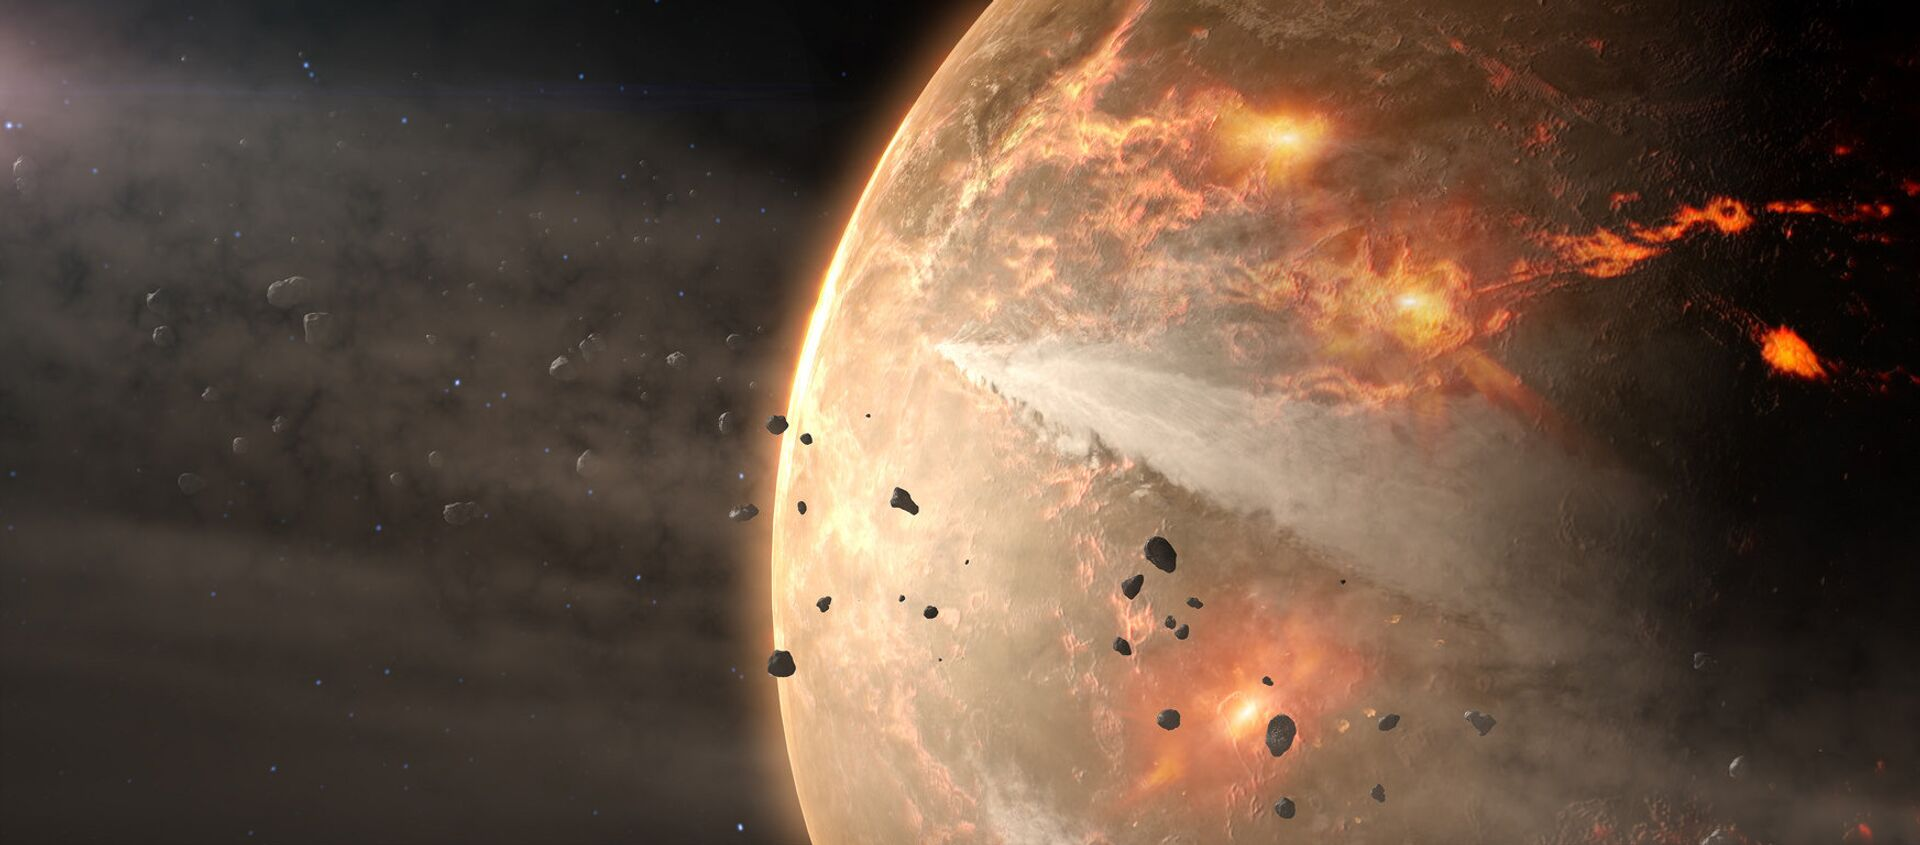 El viaje del asteroide Bennu - Sputnik Mundo, 1920, 22.10.2020